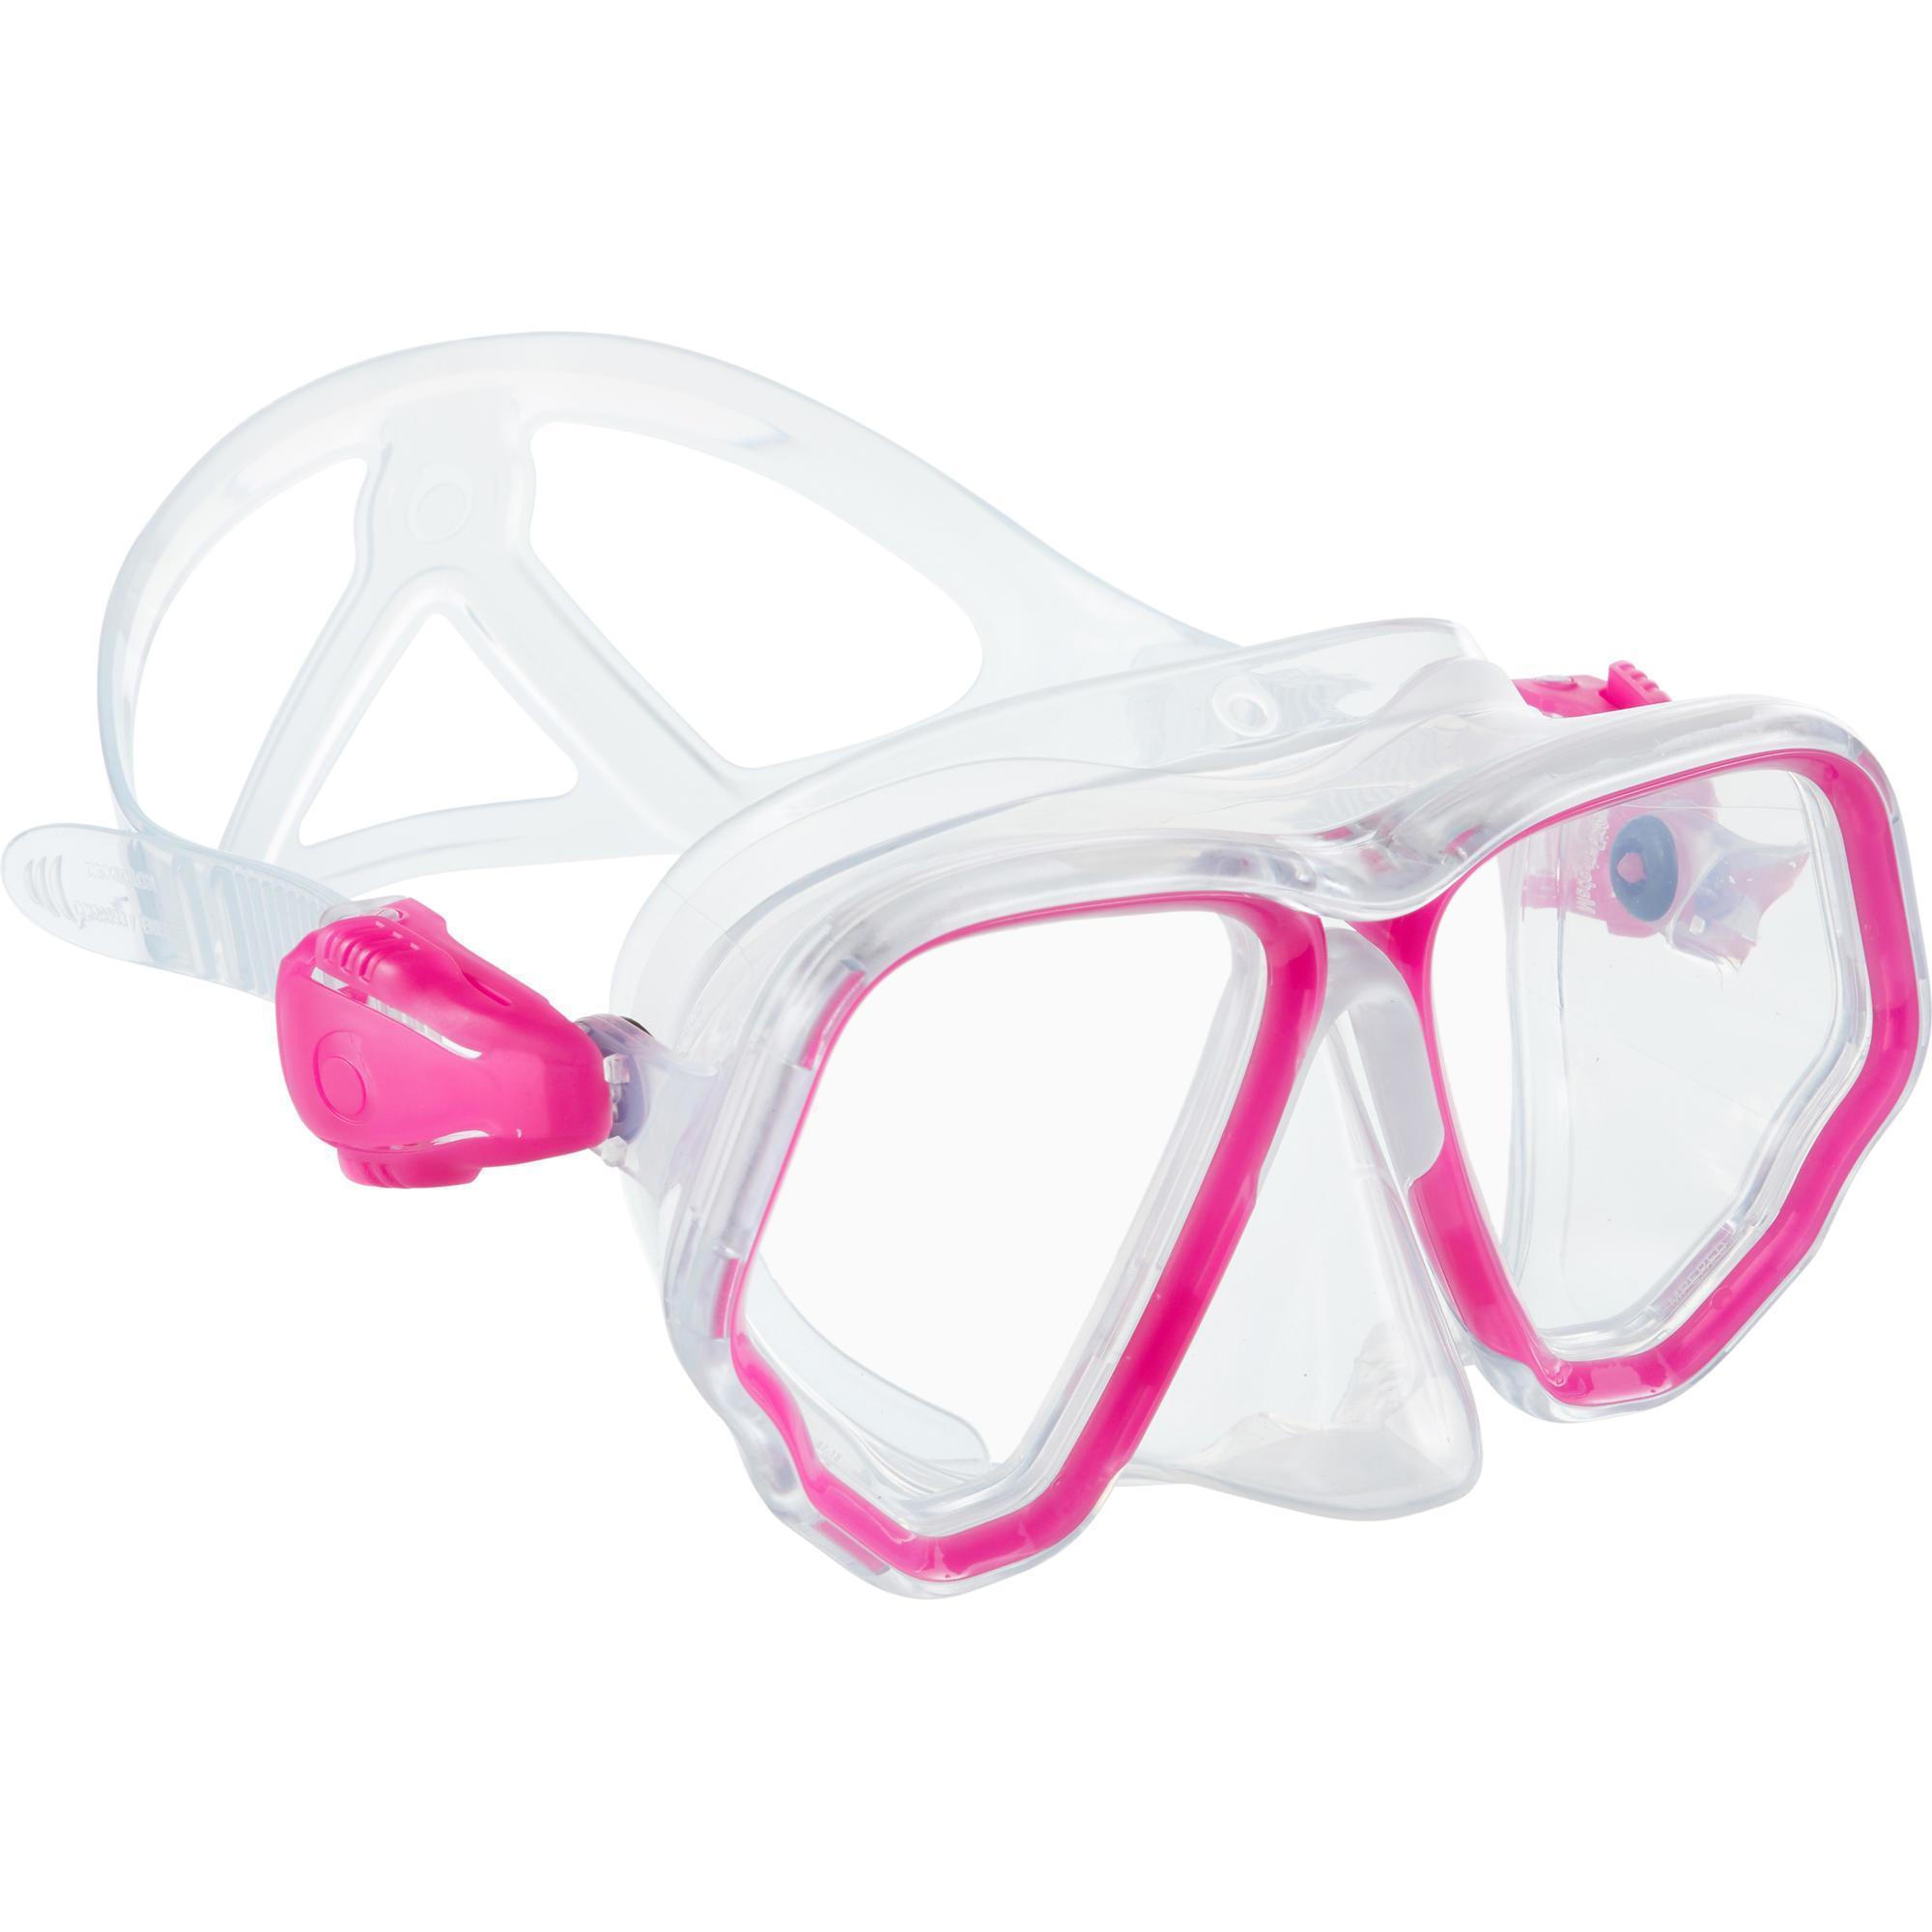 Masque de plongée sous marine SCD 500 Bi-hublot jupe cristal et rose - Subea